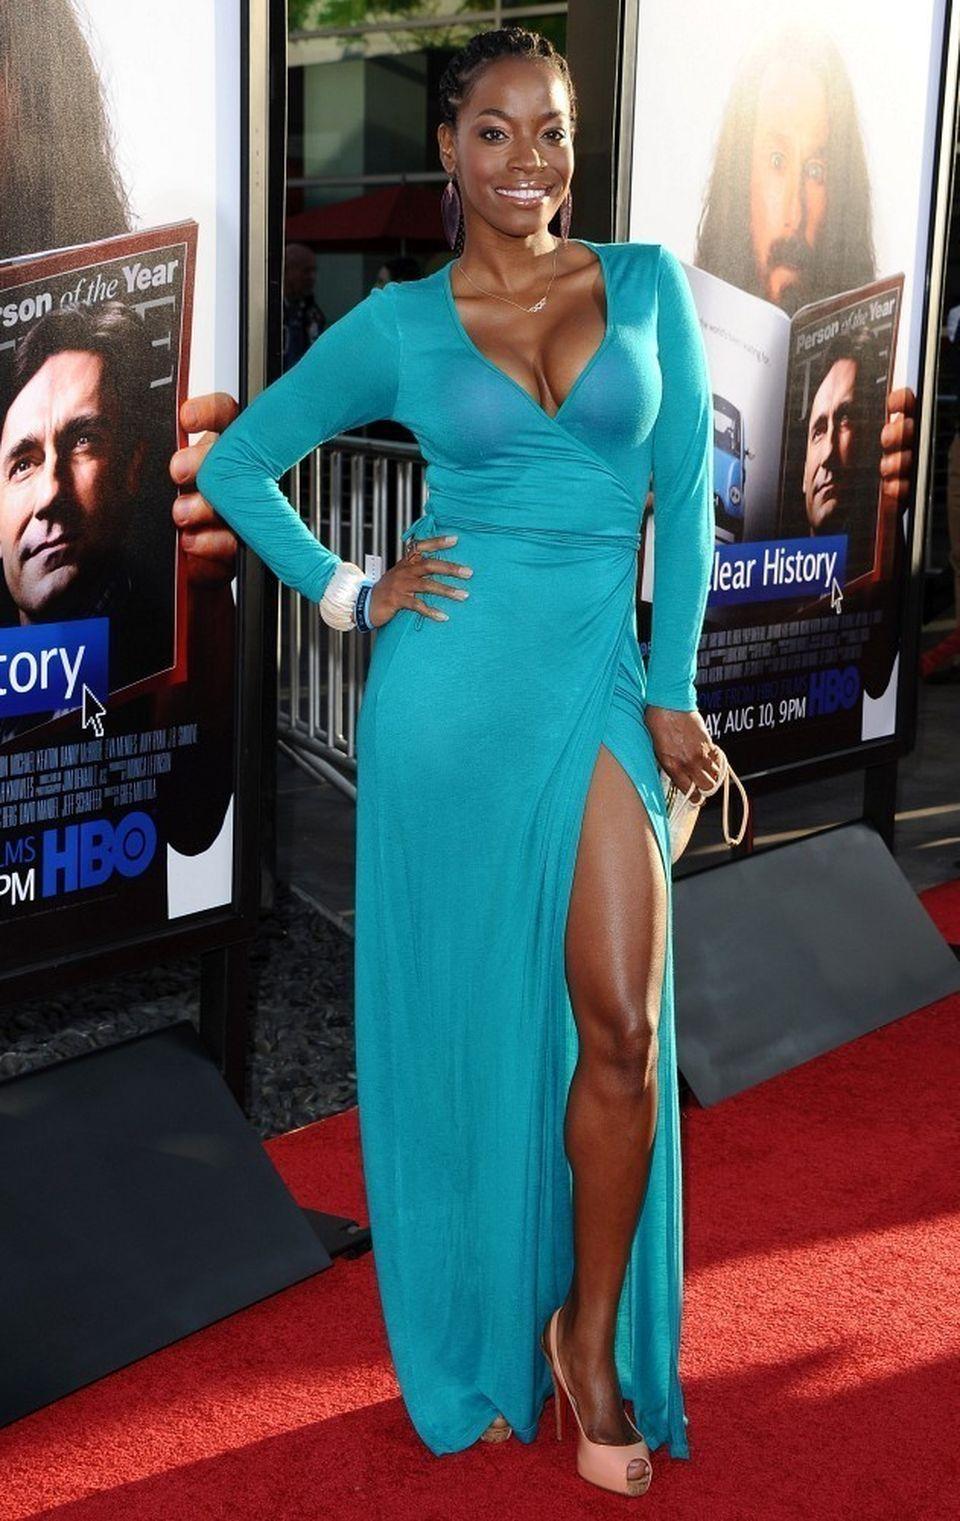 DressesEvening Wrap Milauna JacksonCurves DressesEvening Wrap Milauna Dress Milauna Dress JacksonCurves F1lKcJT